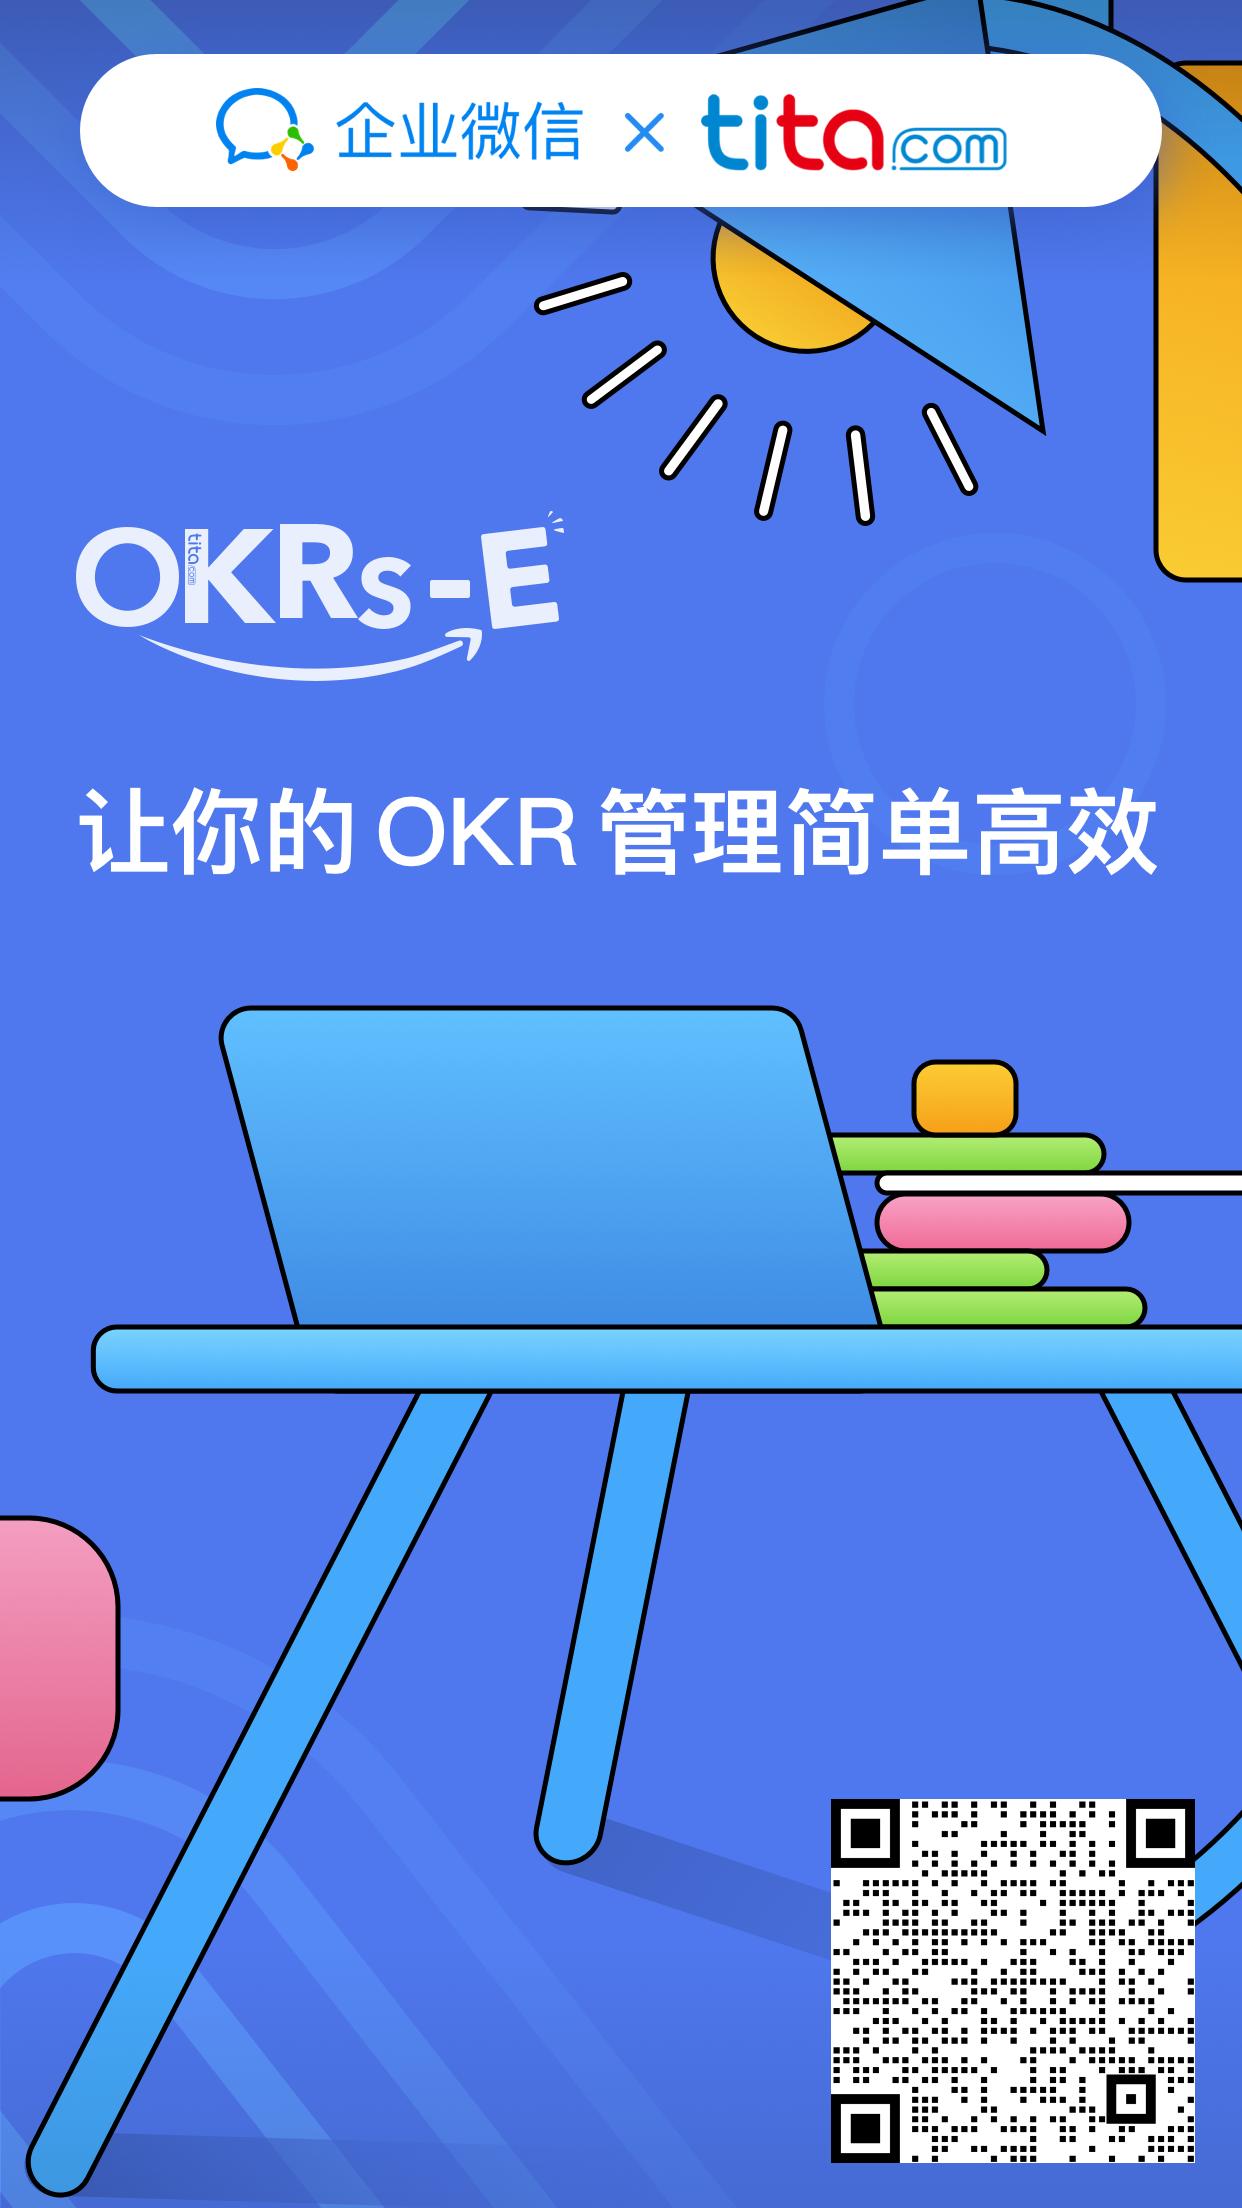 HR,应当担负起推动OKR成功实施的责任